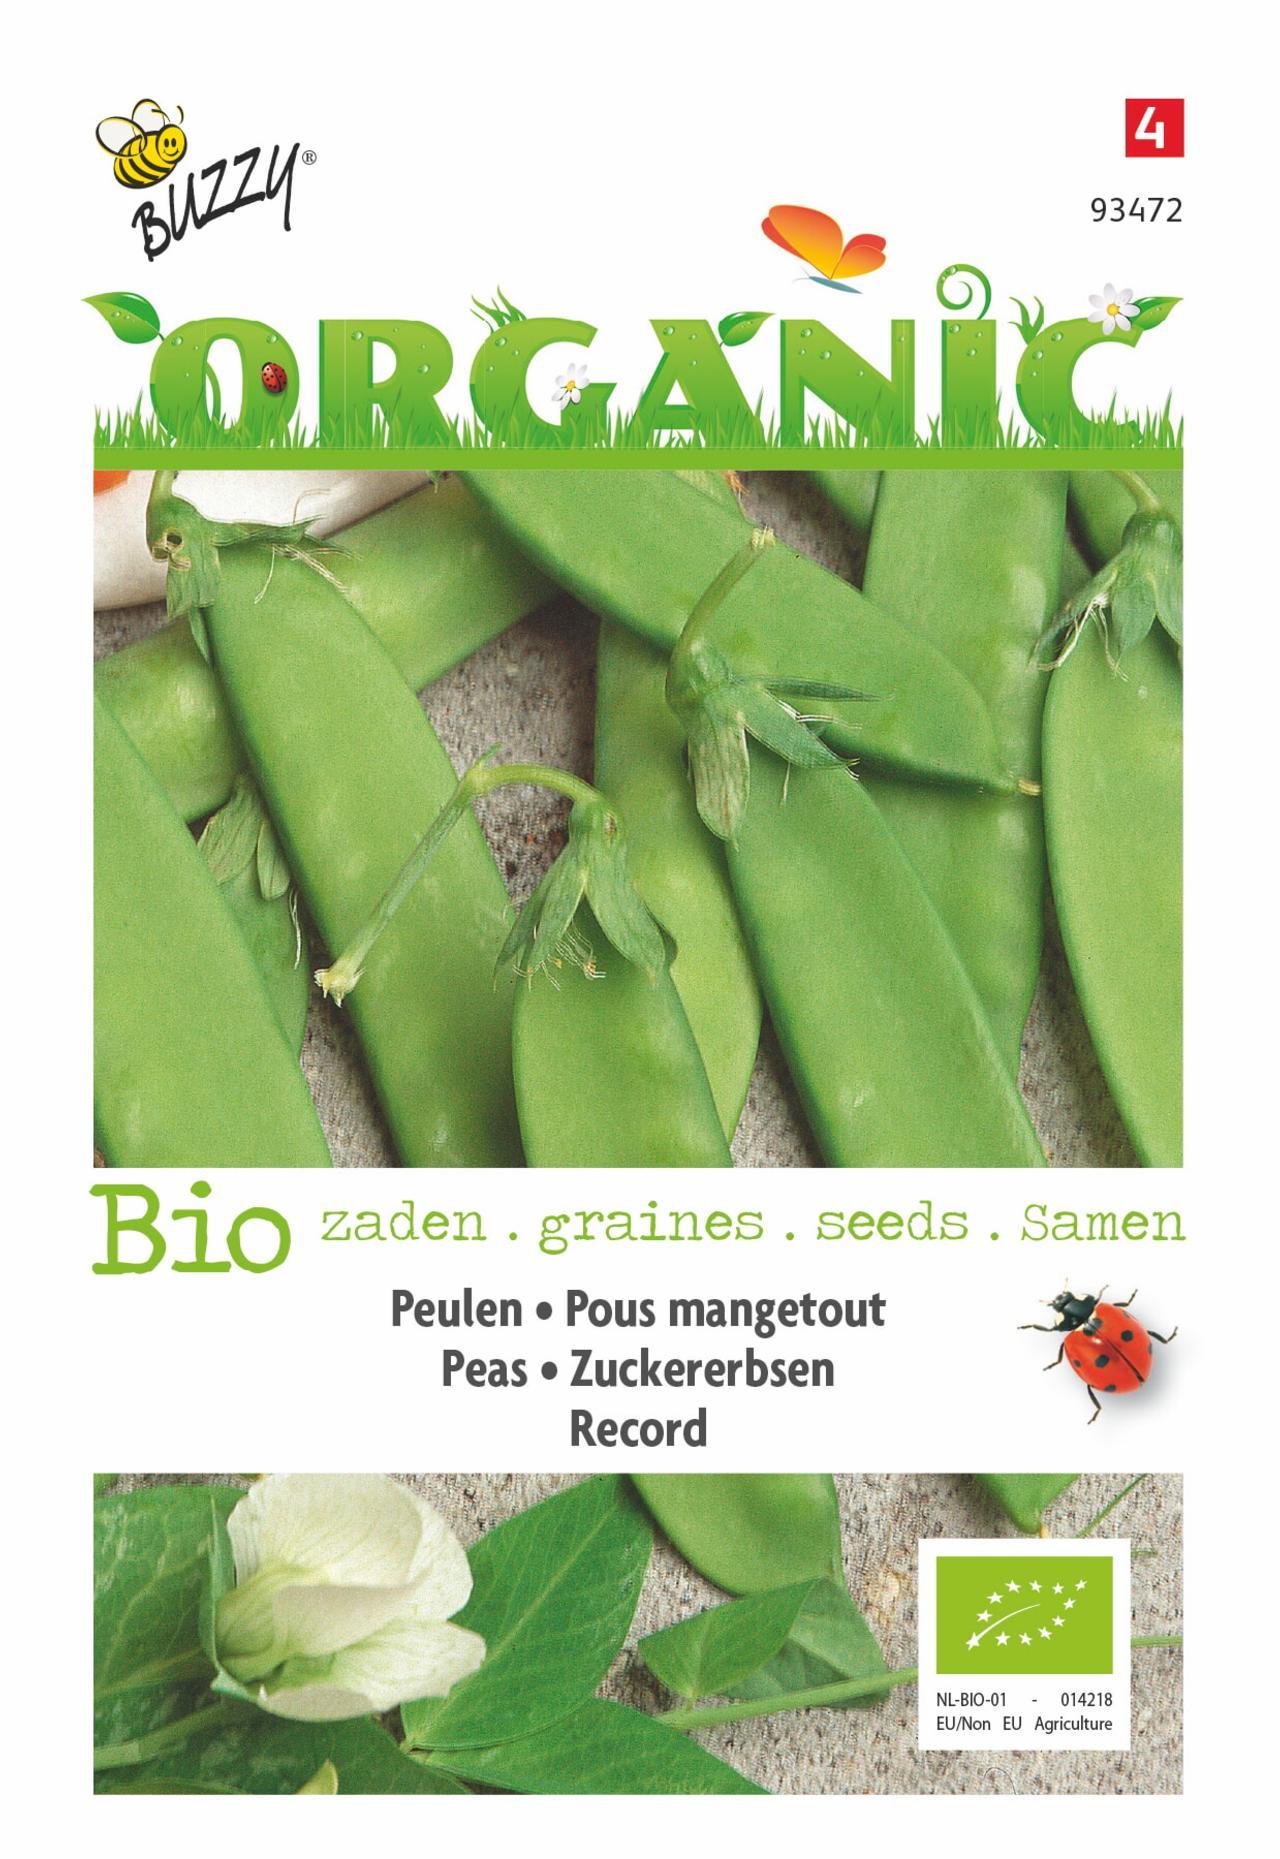 Pisum sativum 'Record' (BIO) plant